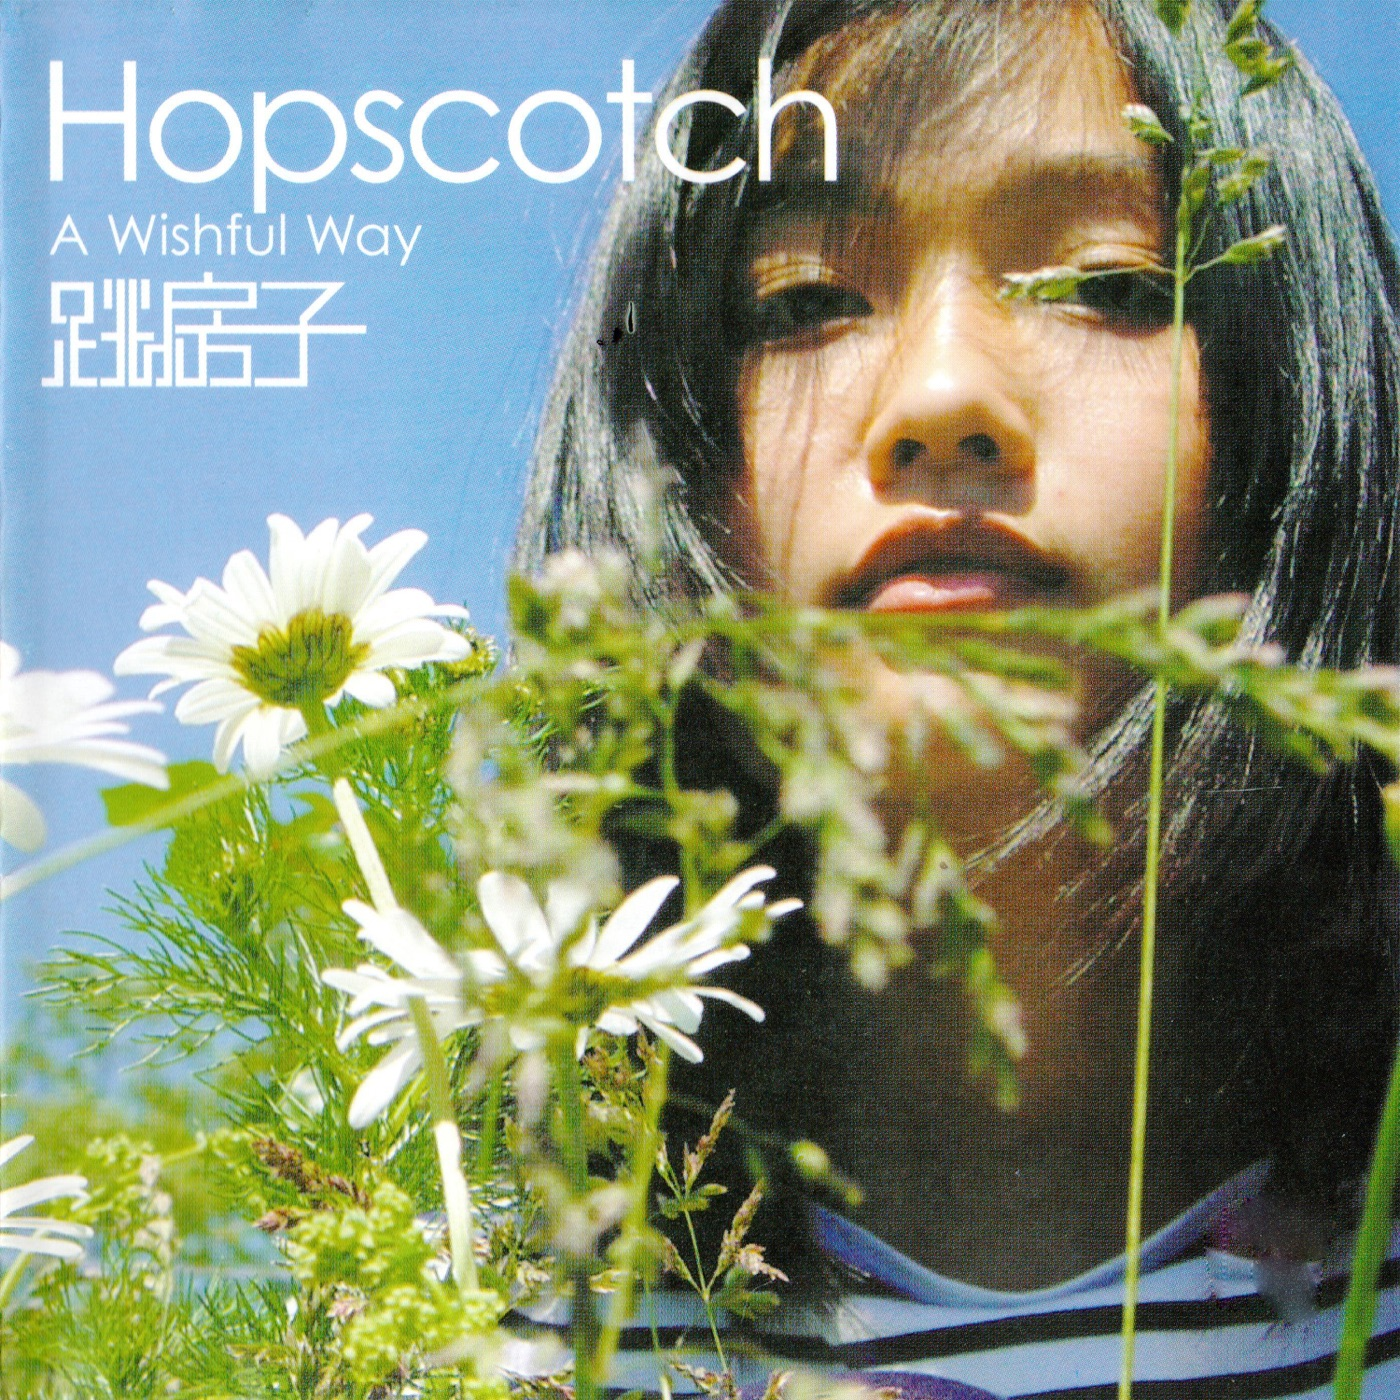 Hopscotch - A Wishful Way